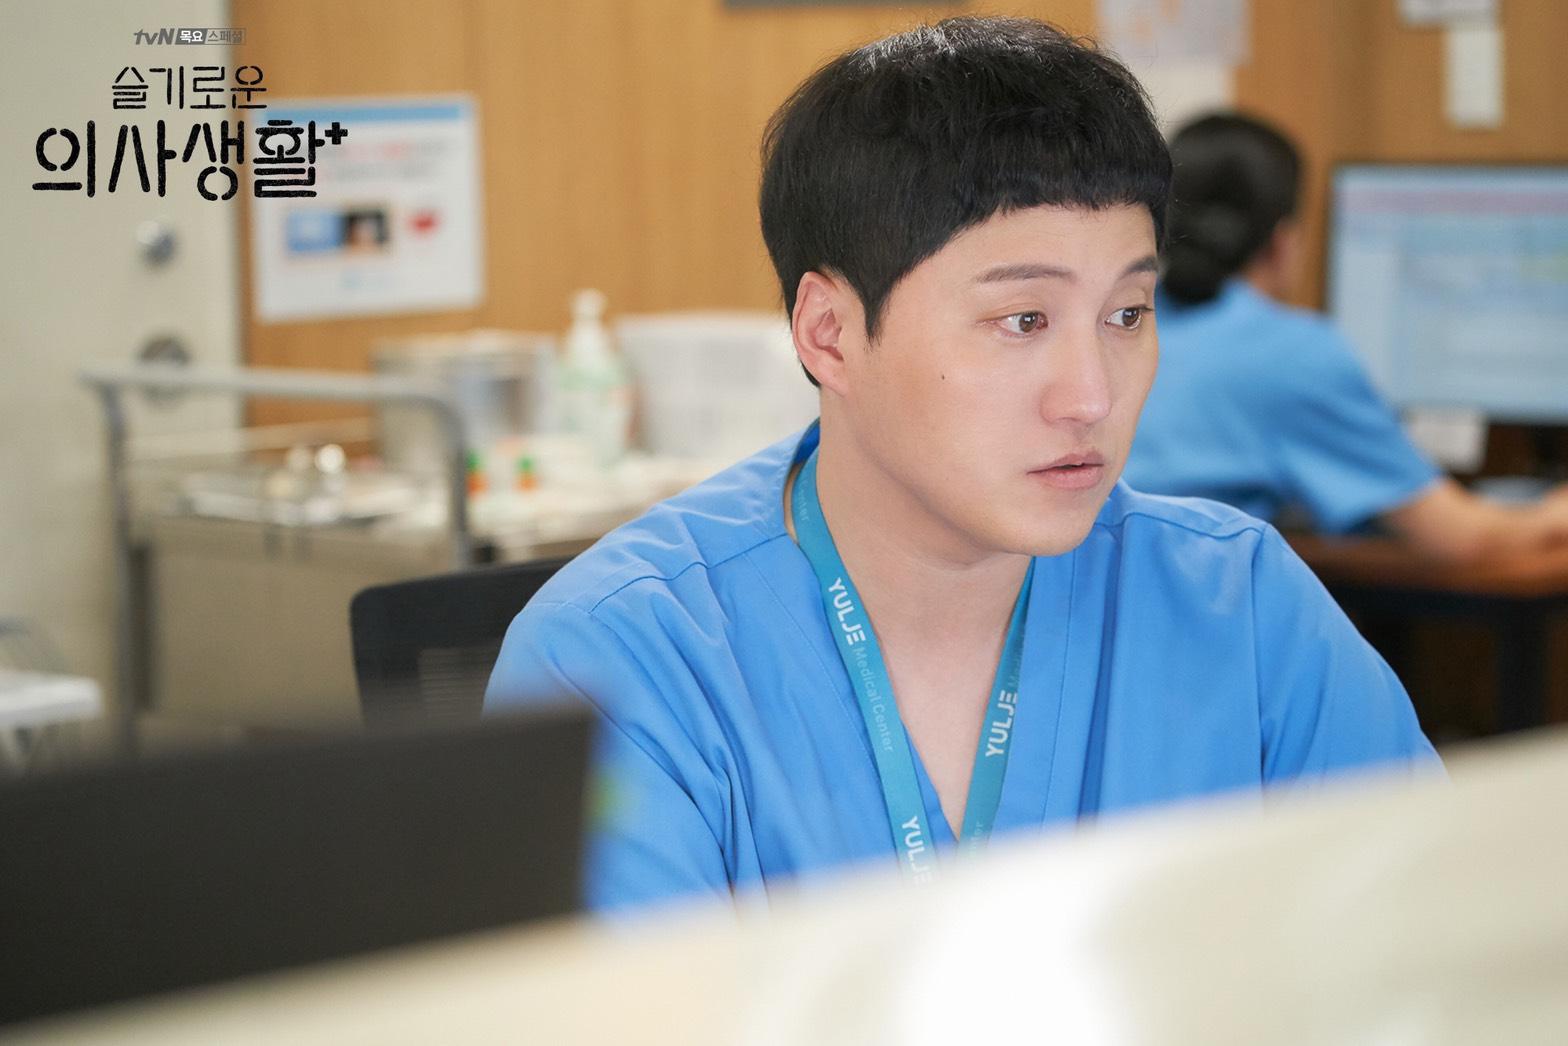 圖片來源/tvN